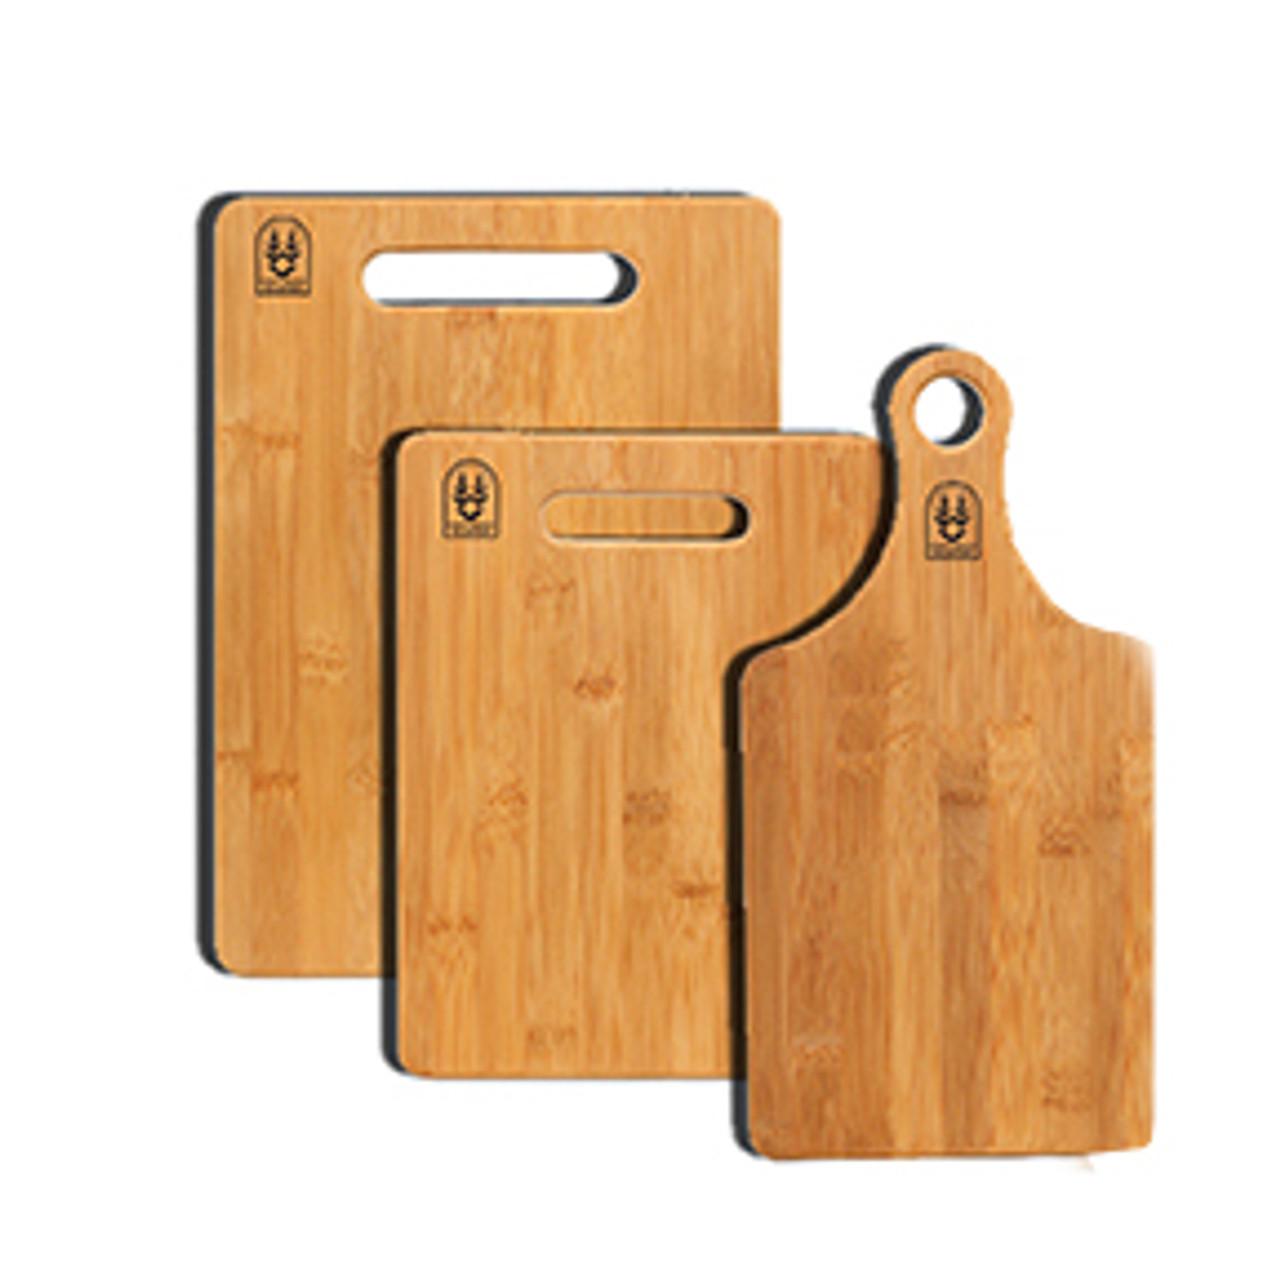 Bamboo Cutting Board - Large Rectangle